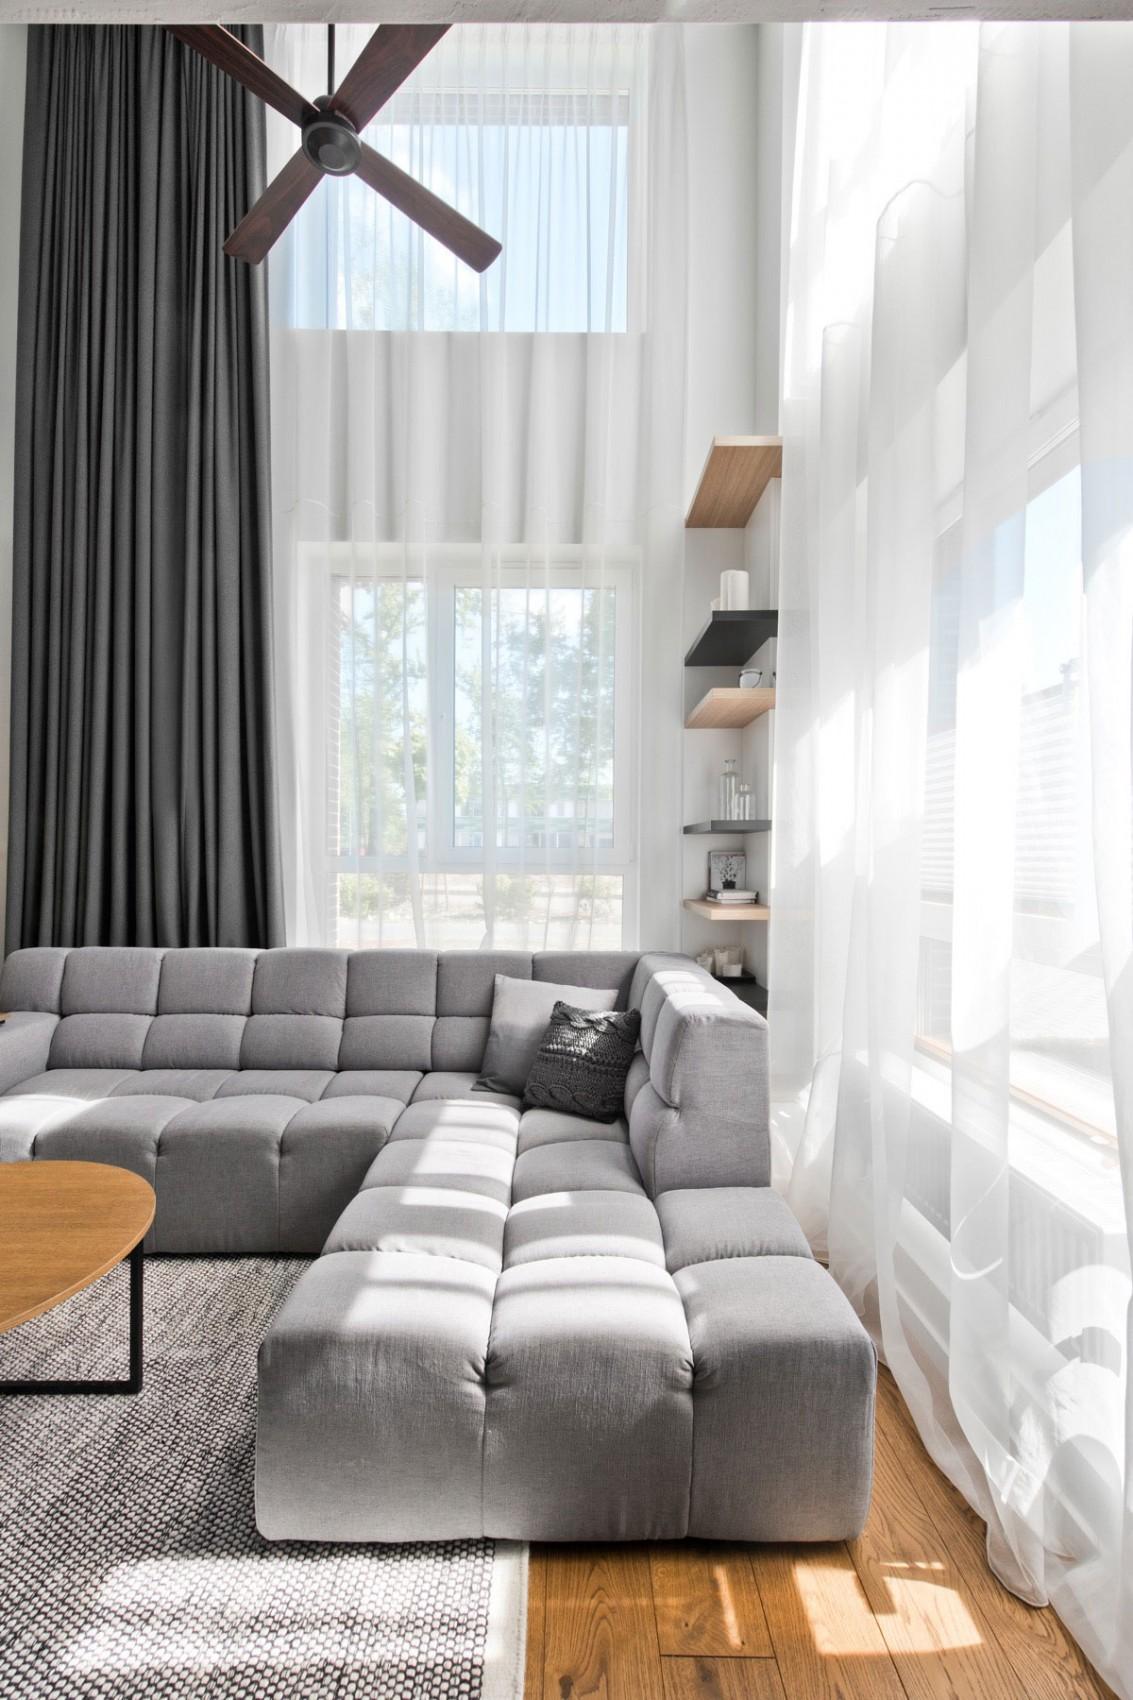 Scandinavian Interior Design In A Beautiful Small